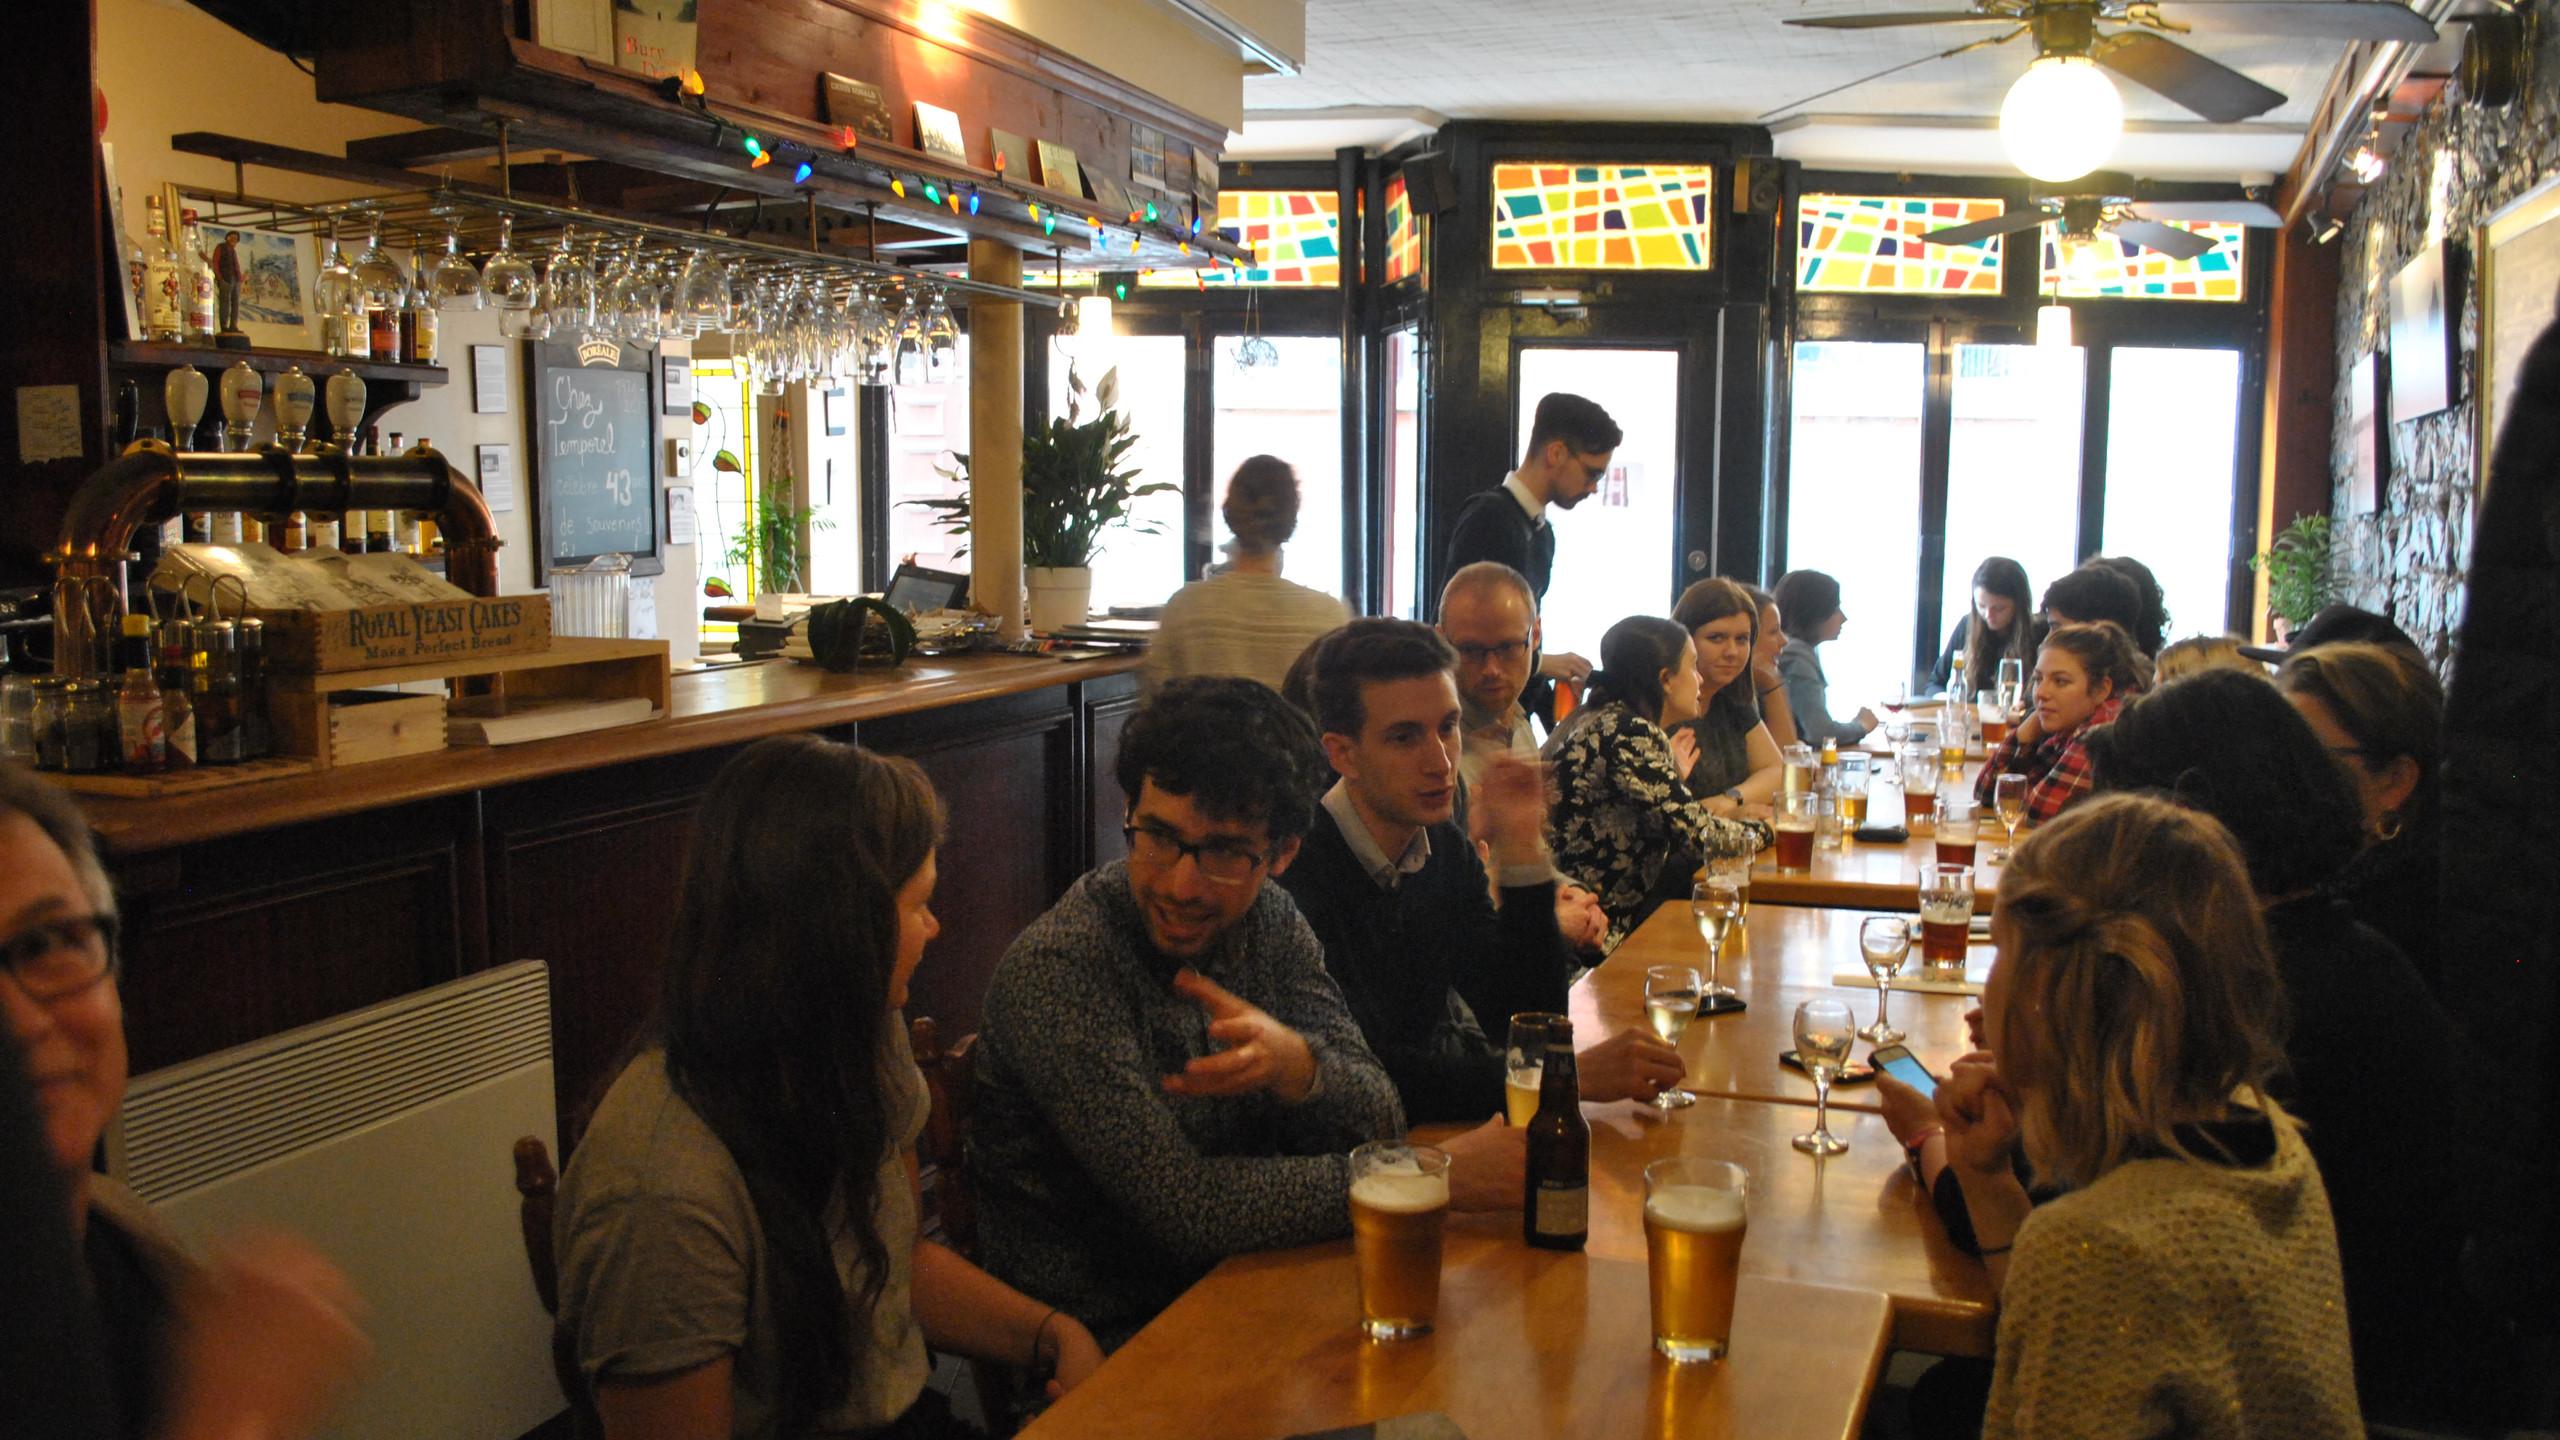 The Students at the Café Temporel